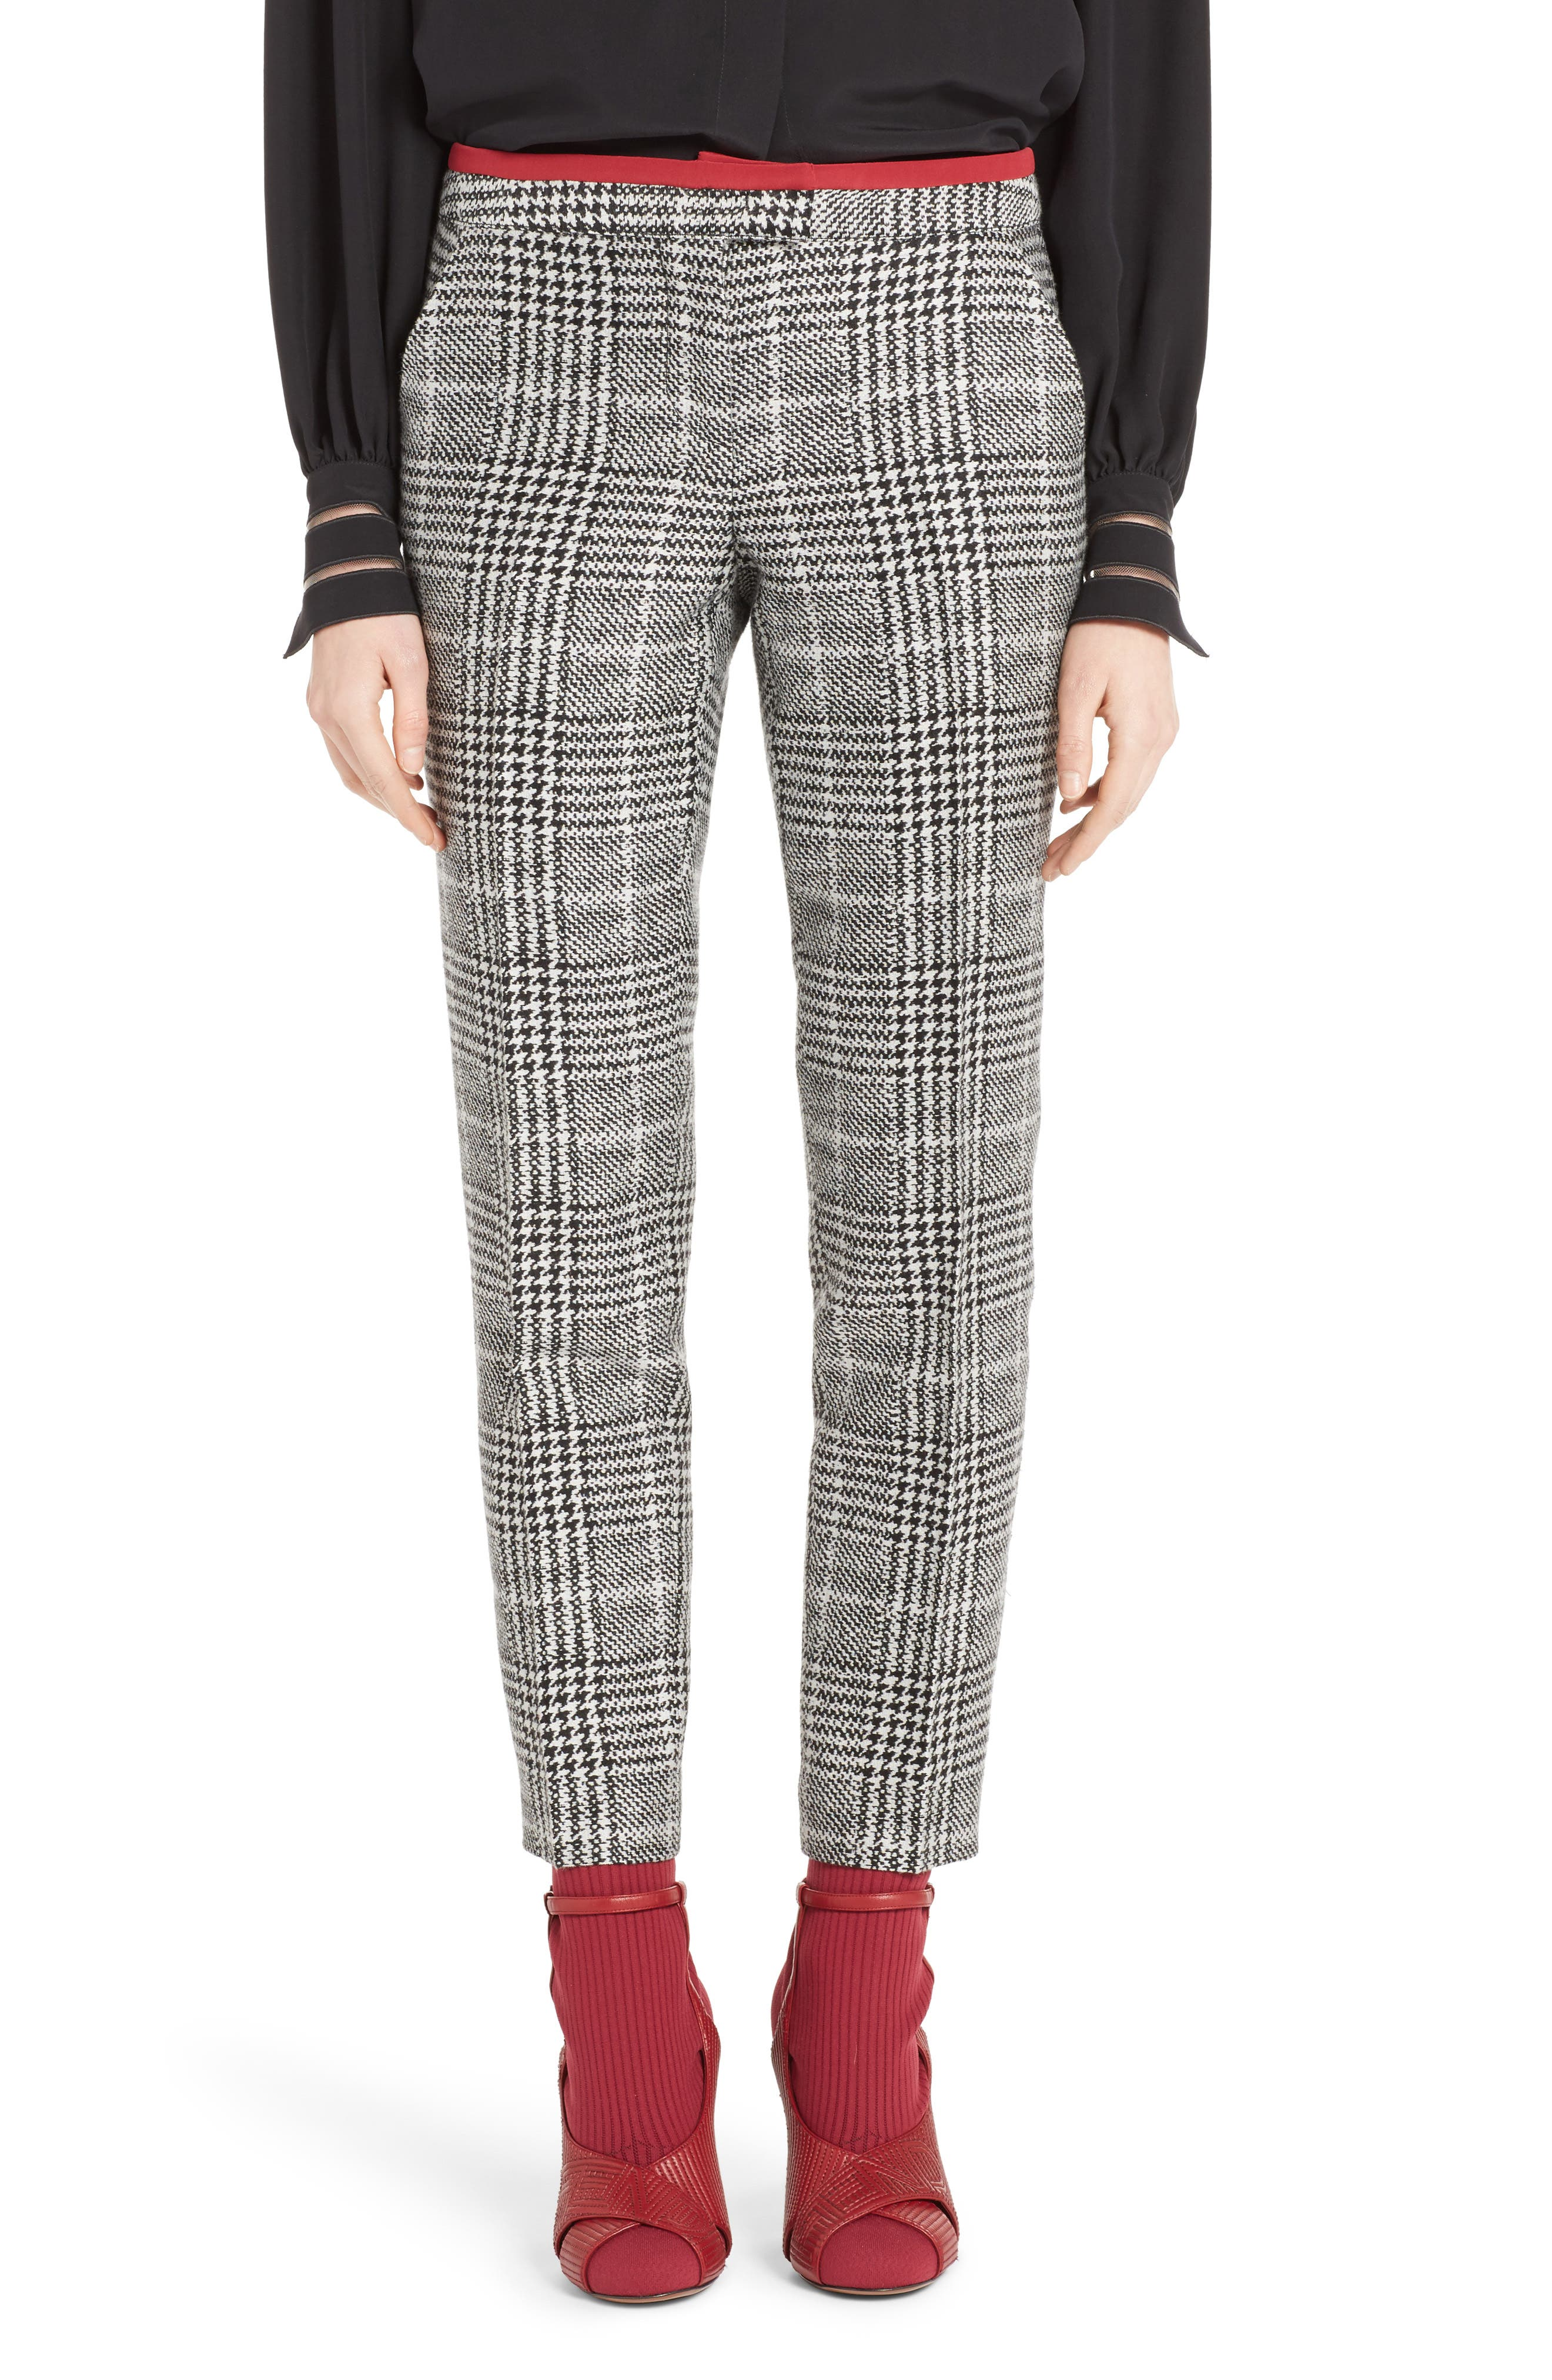 Prince of Wales Print Crop Pants,                         Main,                         color, Black/ White